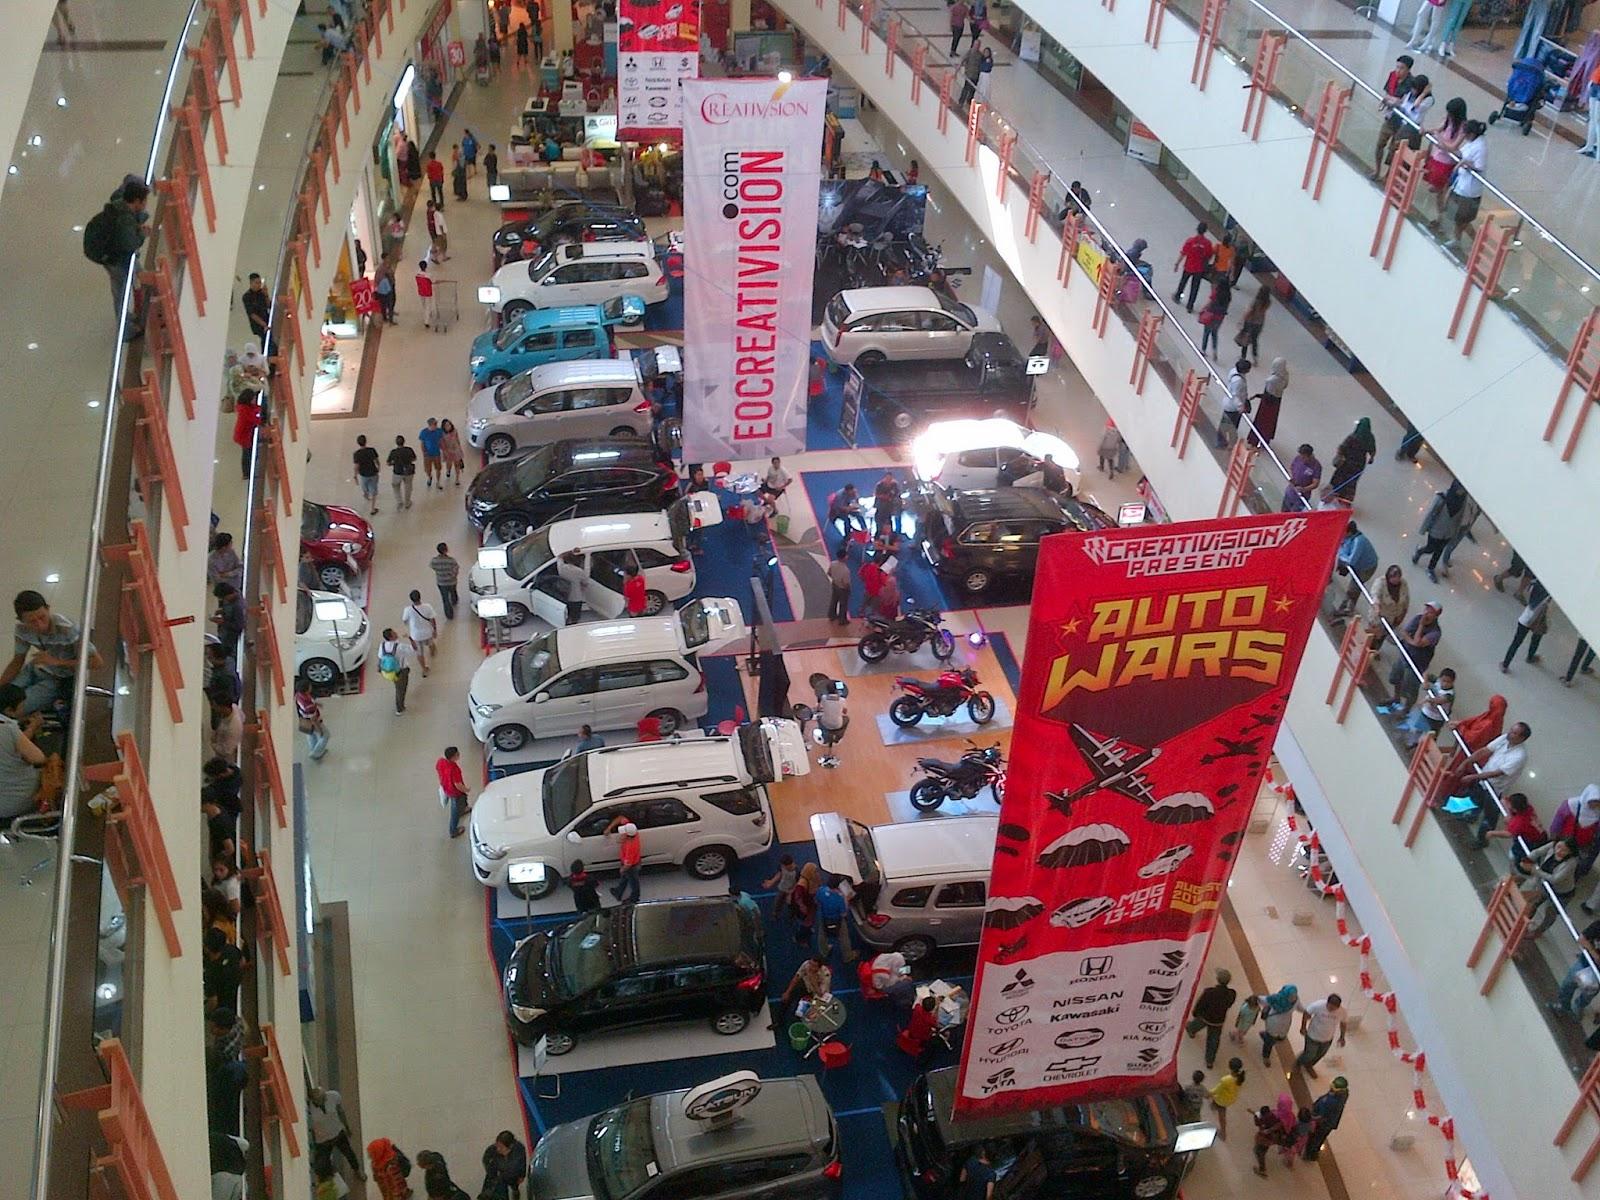 Pameran Otomotive : Auto Wars di Mall Olympic Garden